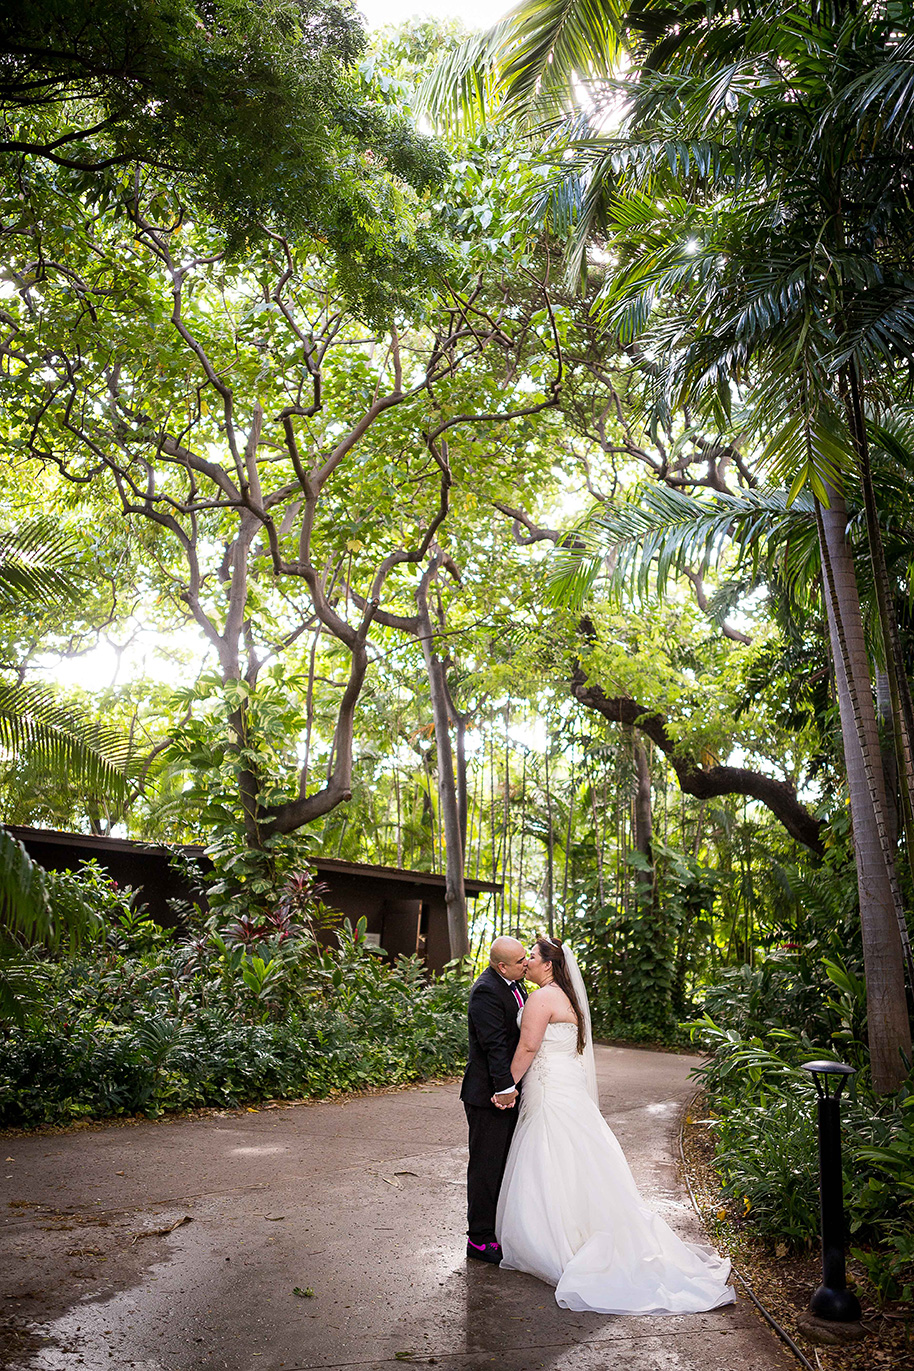 Star-Wars-Wedding-040116-30.jpg